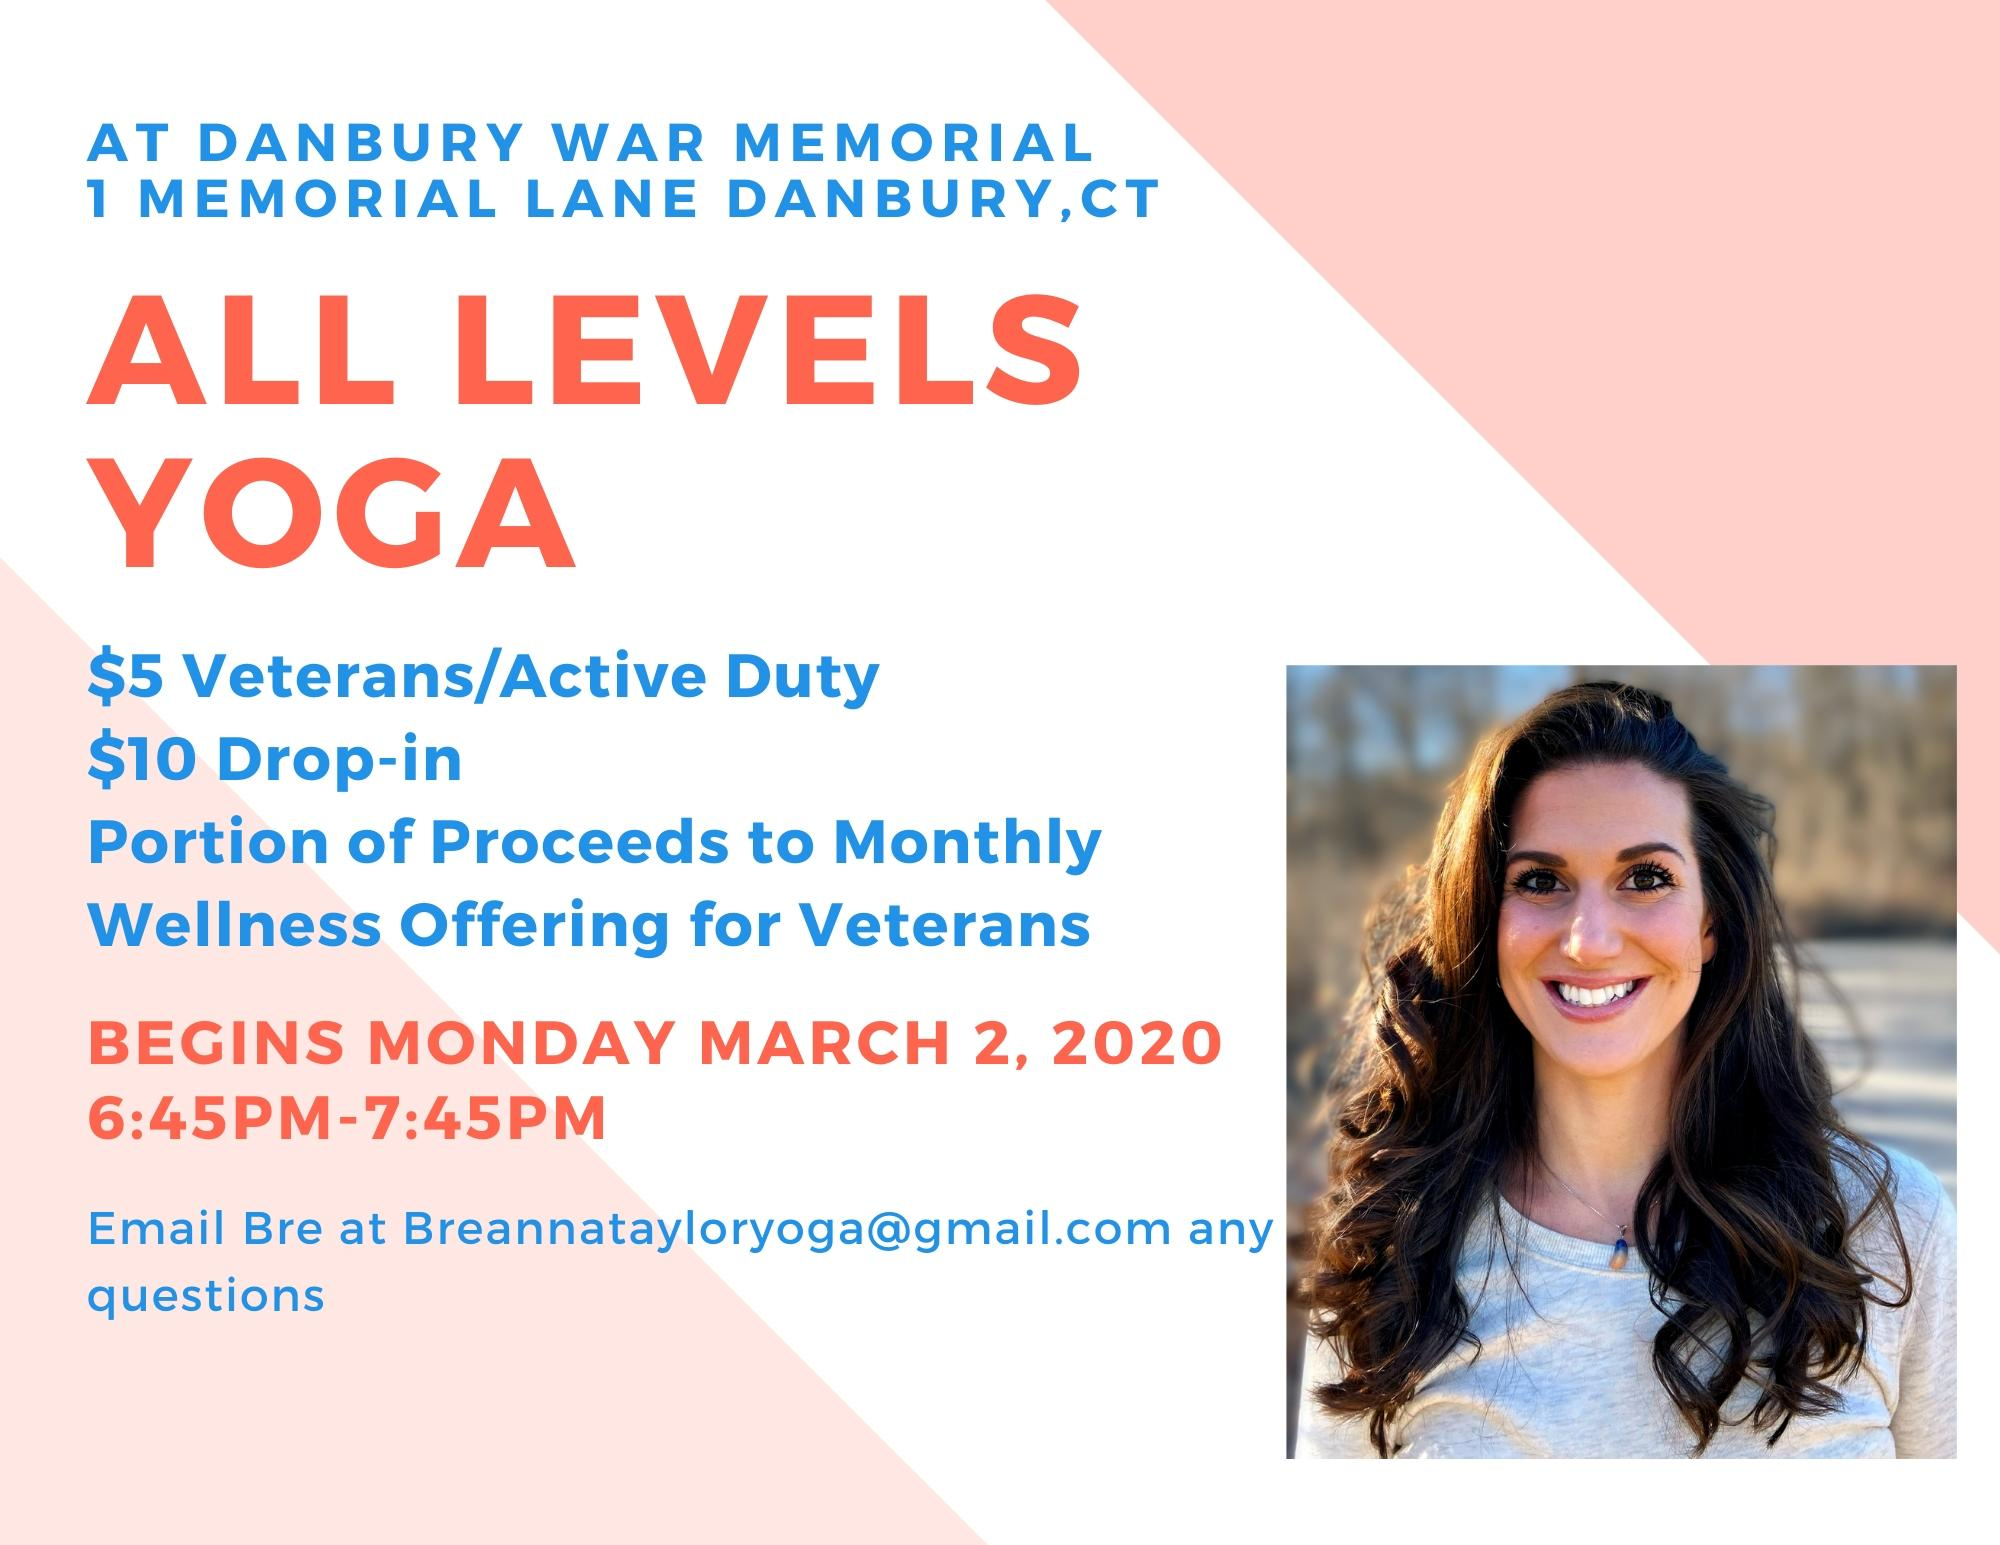 All Levels Yoga for Veteran's Wellness